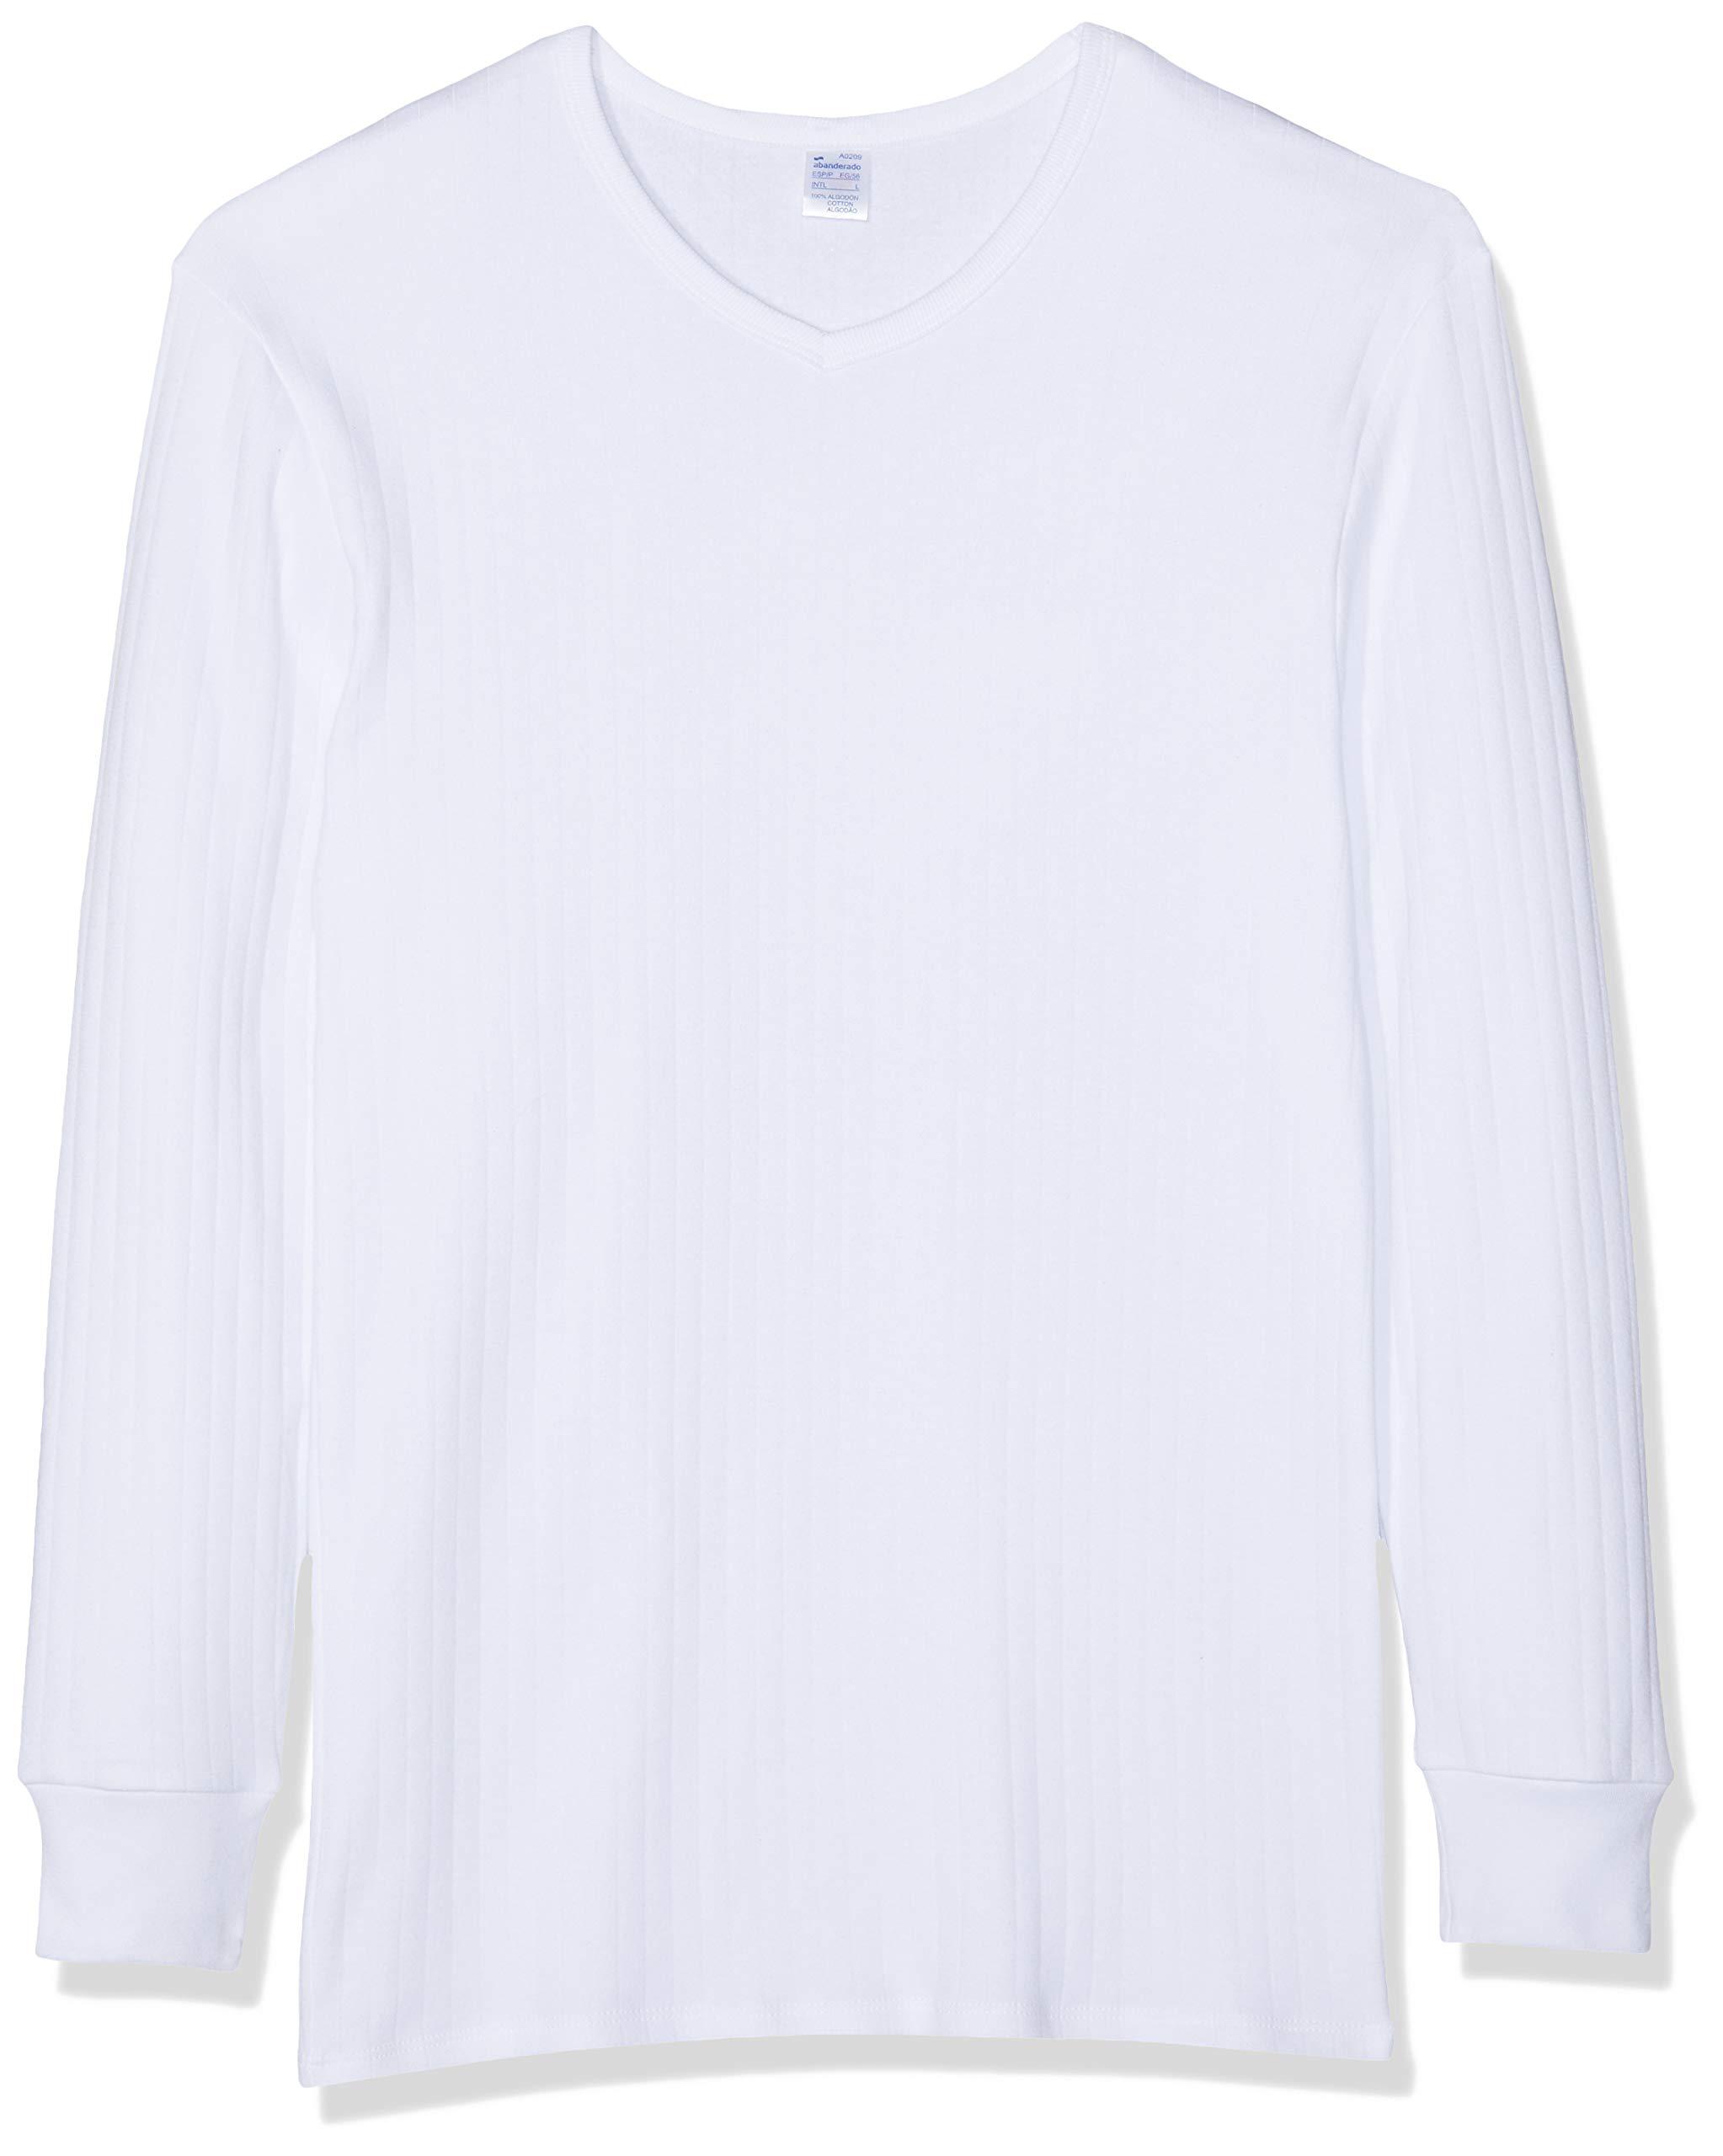 Mejor valorados en Camisetas térmicas para hombre ...